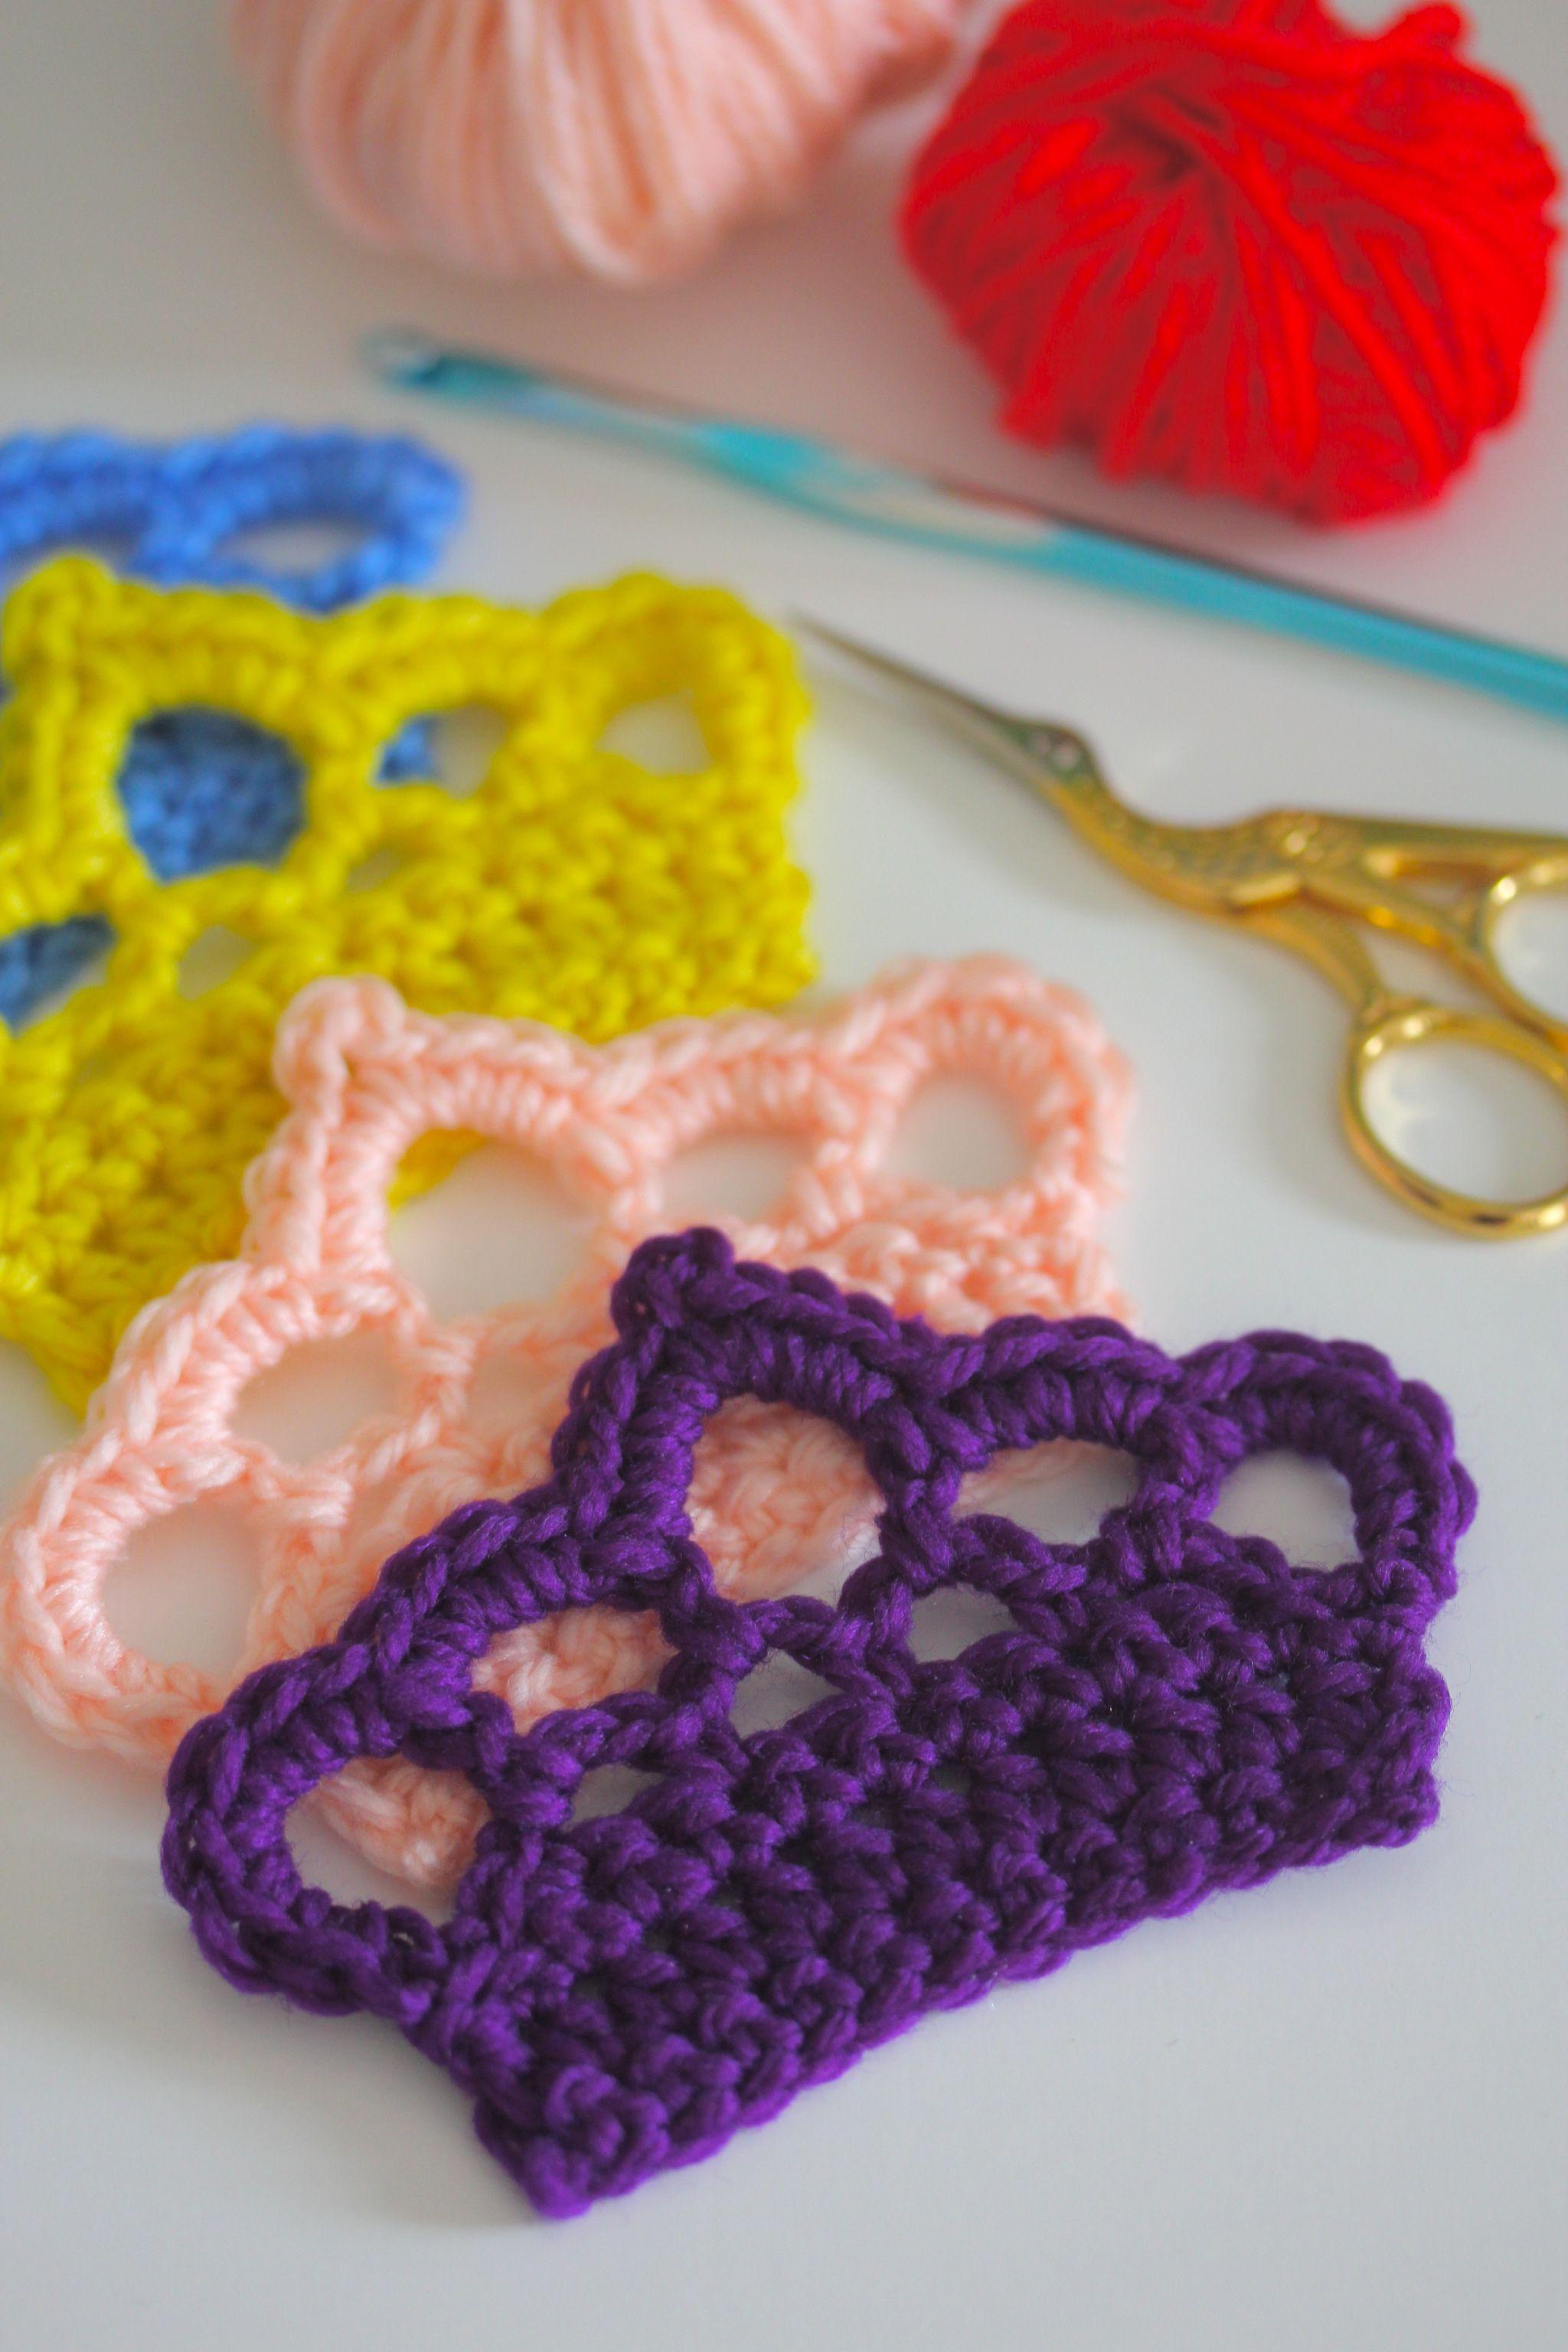 Commemorative Crocheted Crown | Pinterest